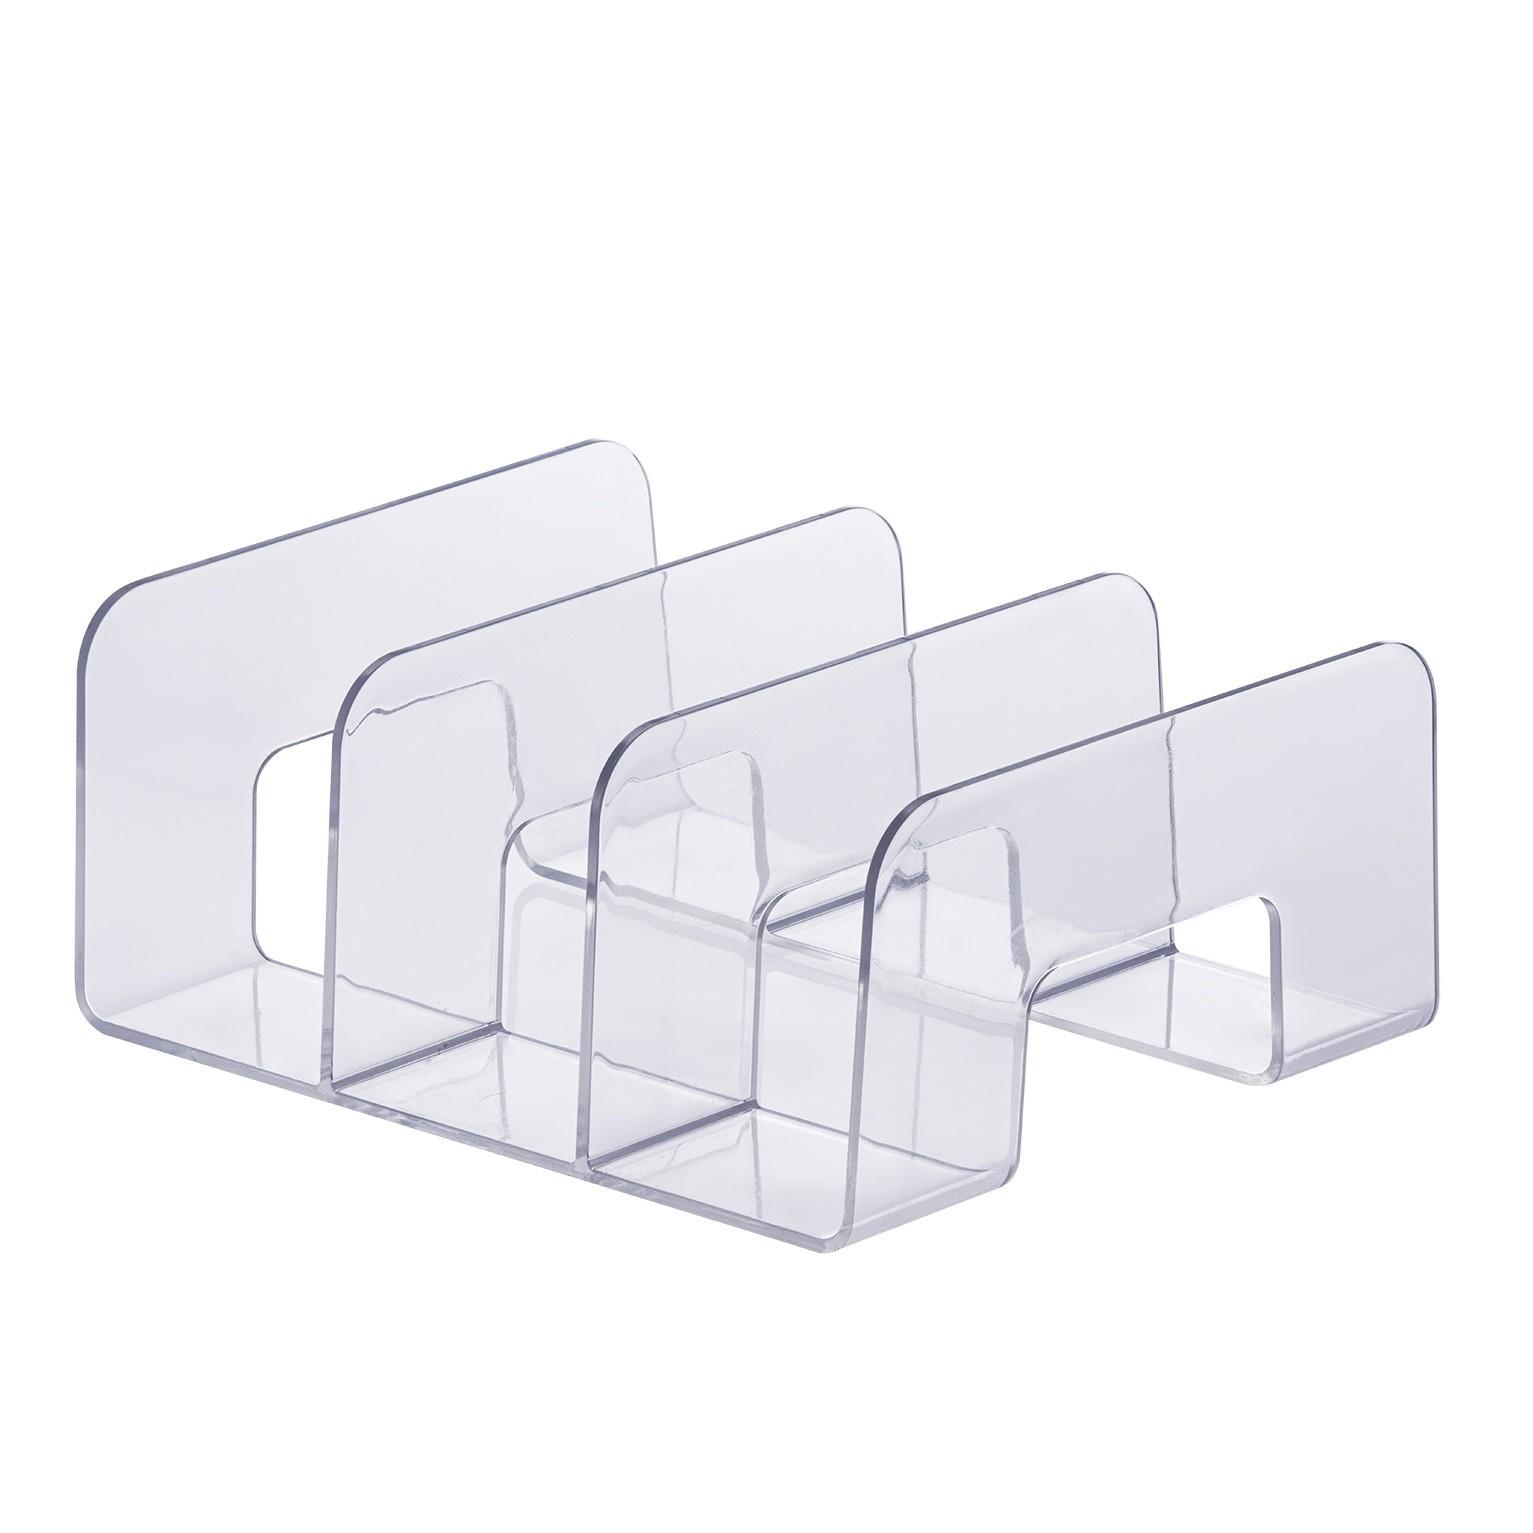 Organizador Multiuso Acrilico 20x10cm 3 Divisorias Transparente - Paramount